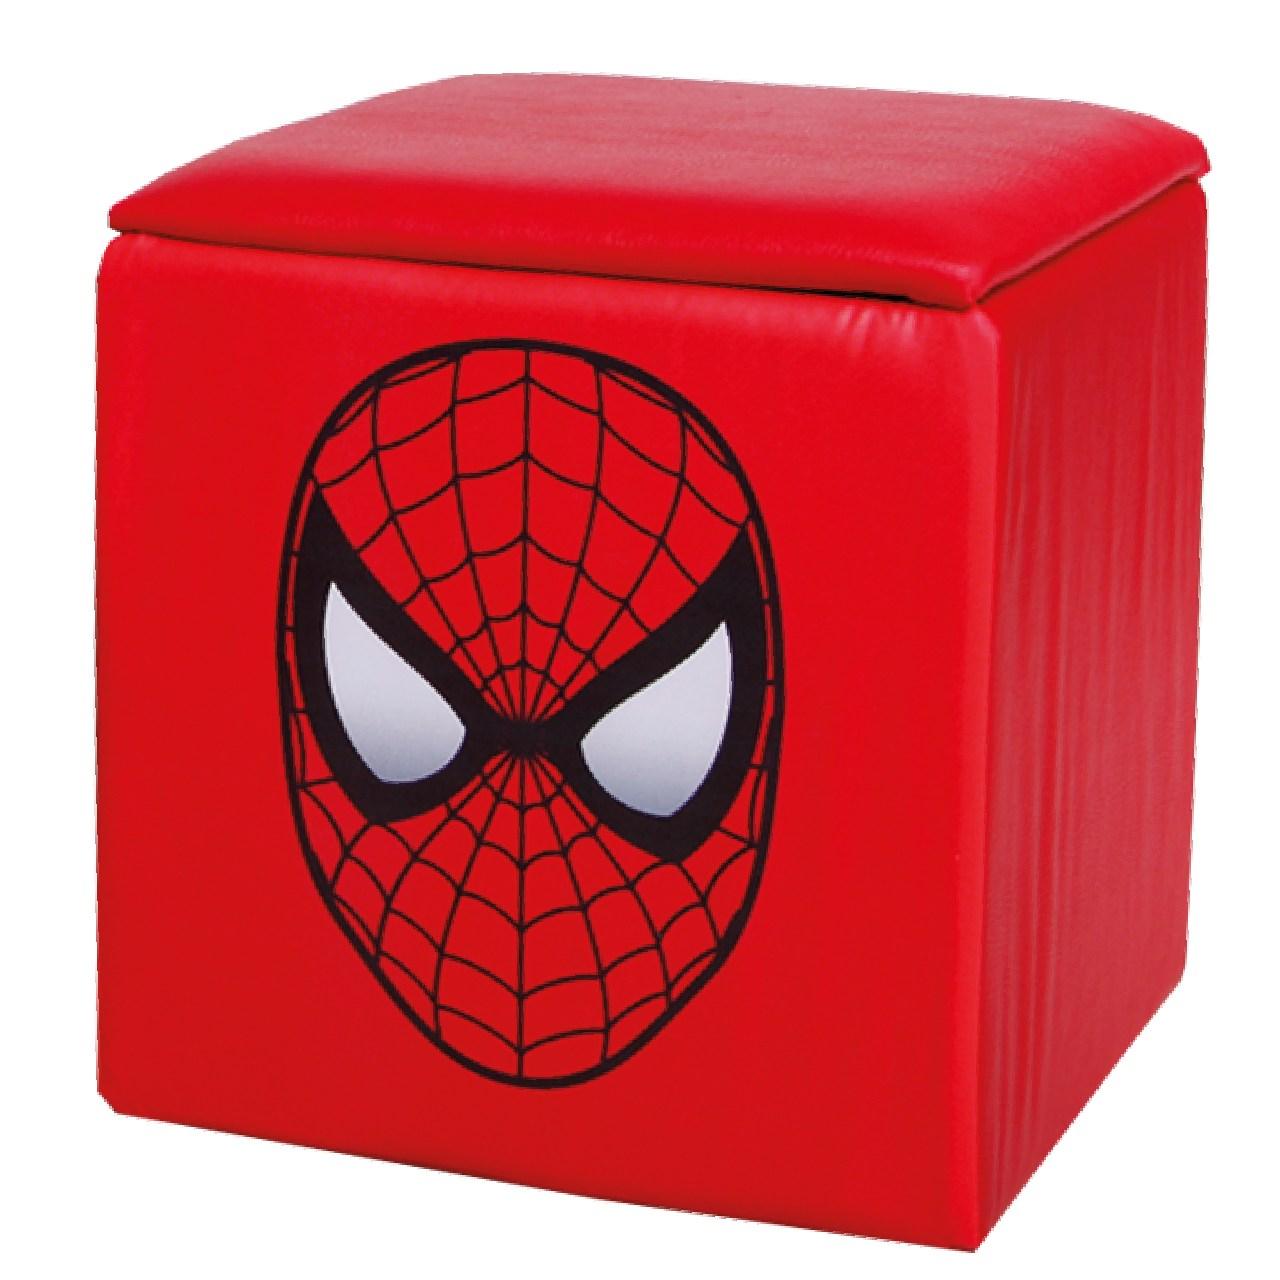 جلو مبلی کودک پینک مدل Spider-man